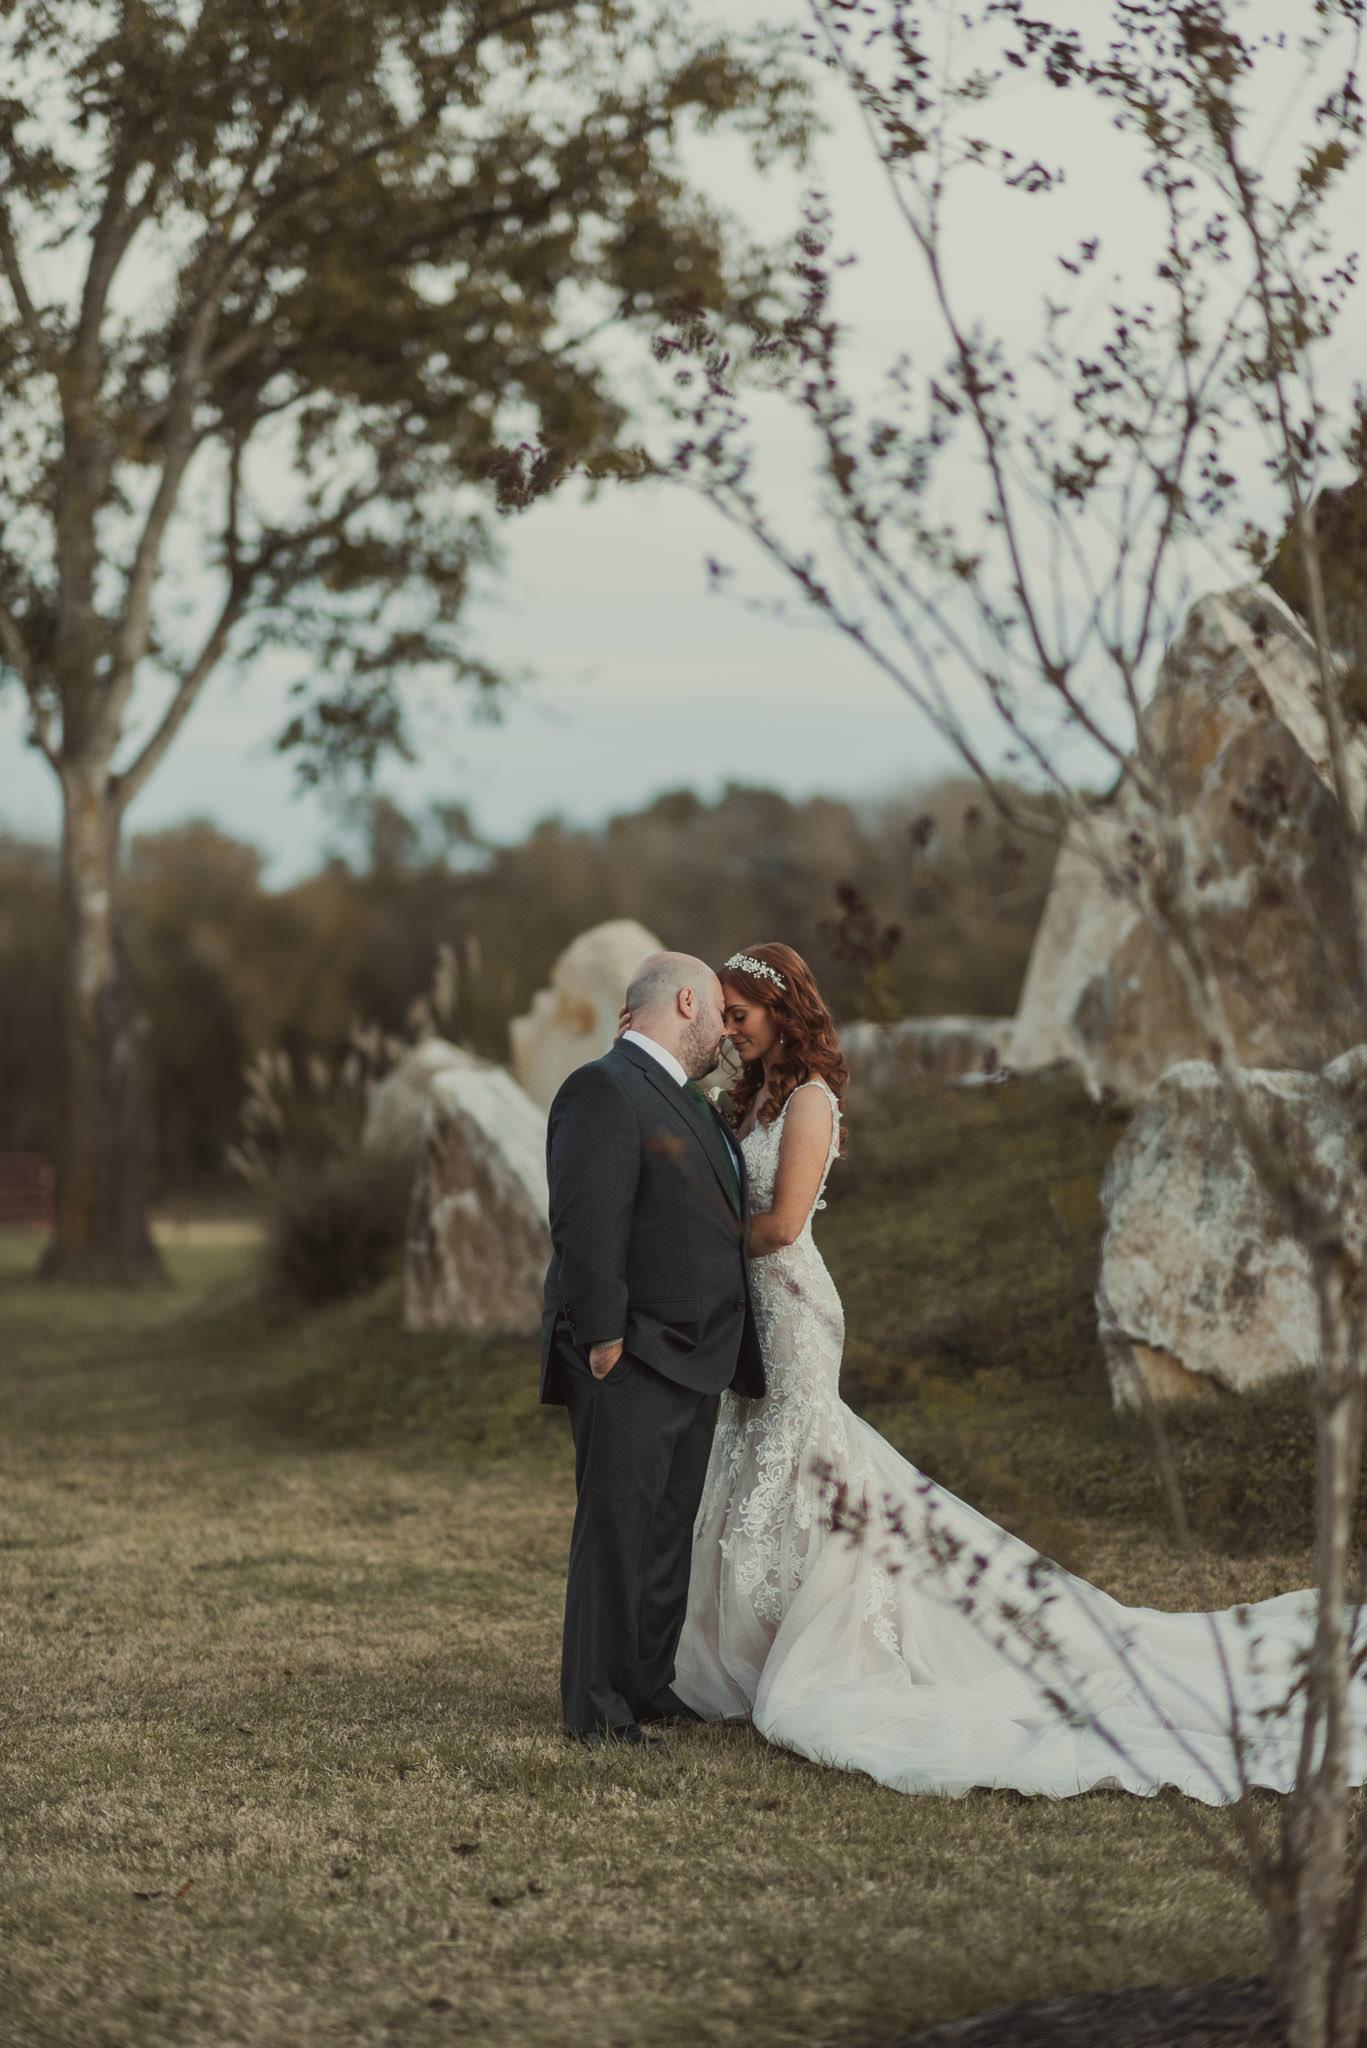 Cynthia-Curtis-Olde-Dobbine-Station-Houston-Wedding-Photographer-sm-80.jpg